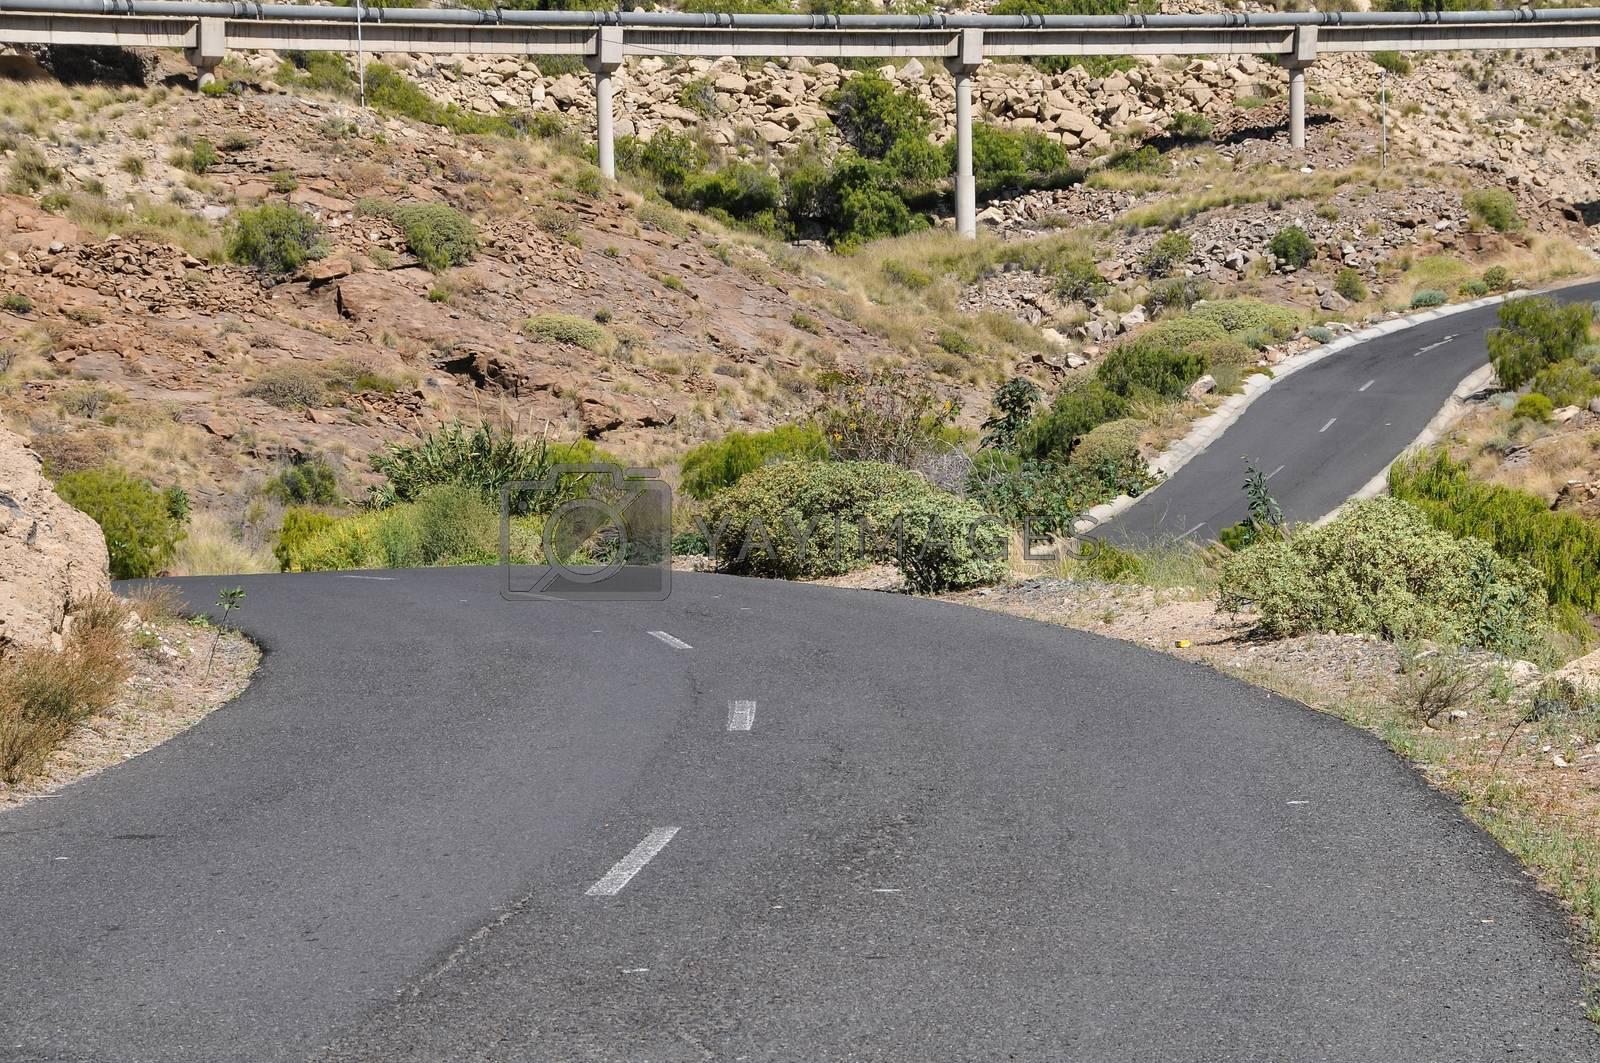 Royalty free image of desert road by underworld